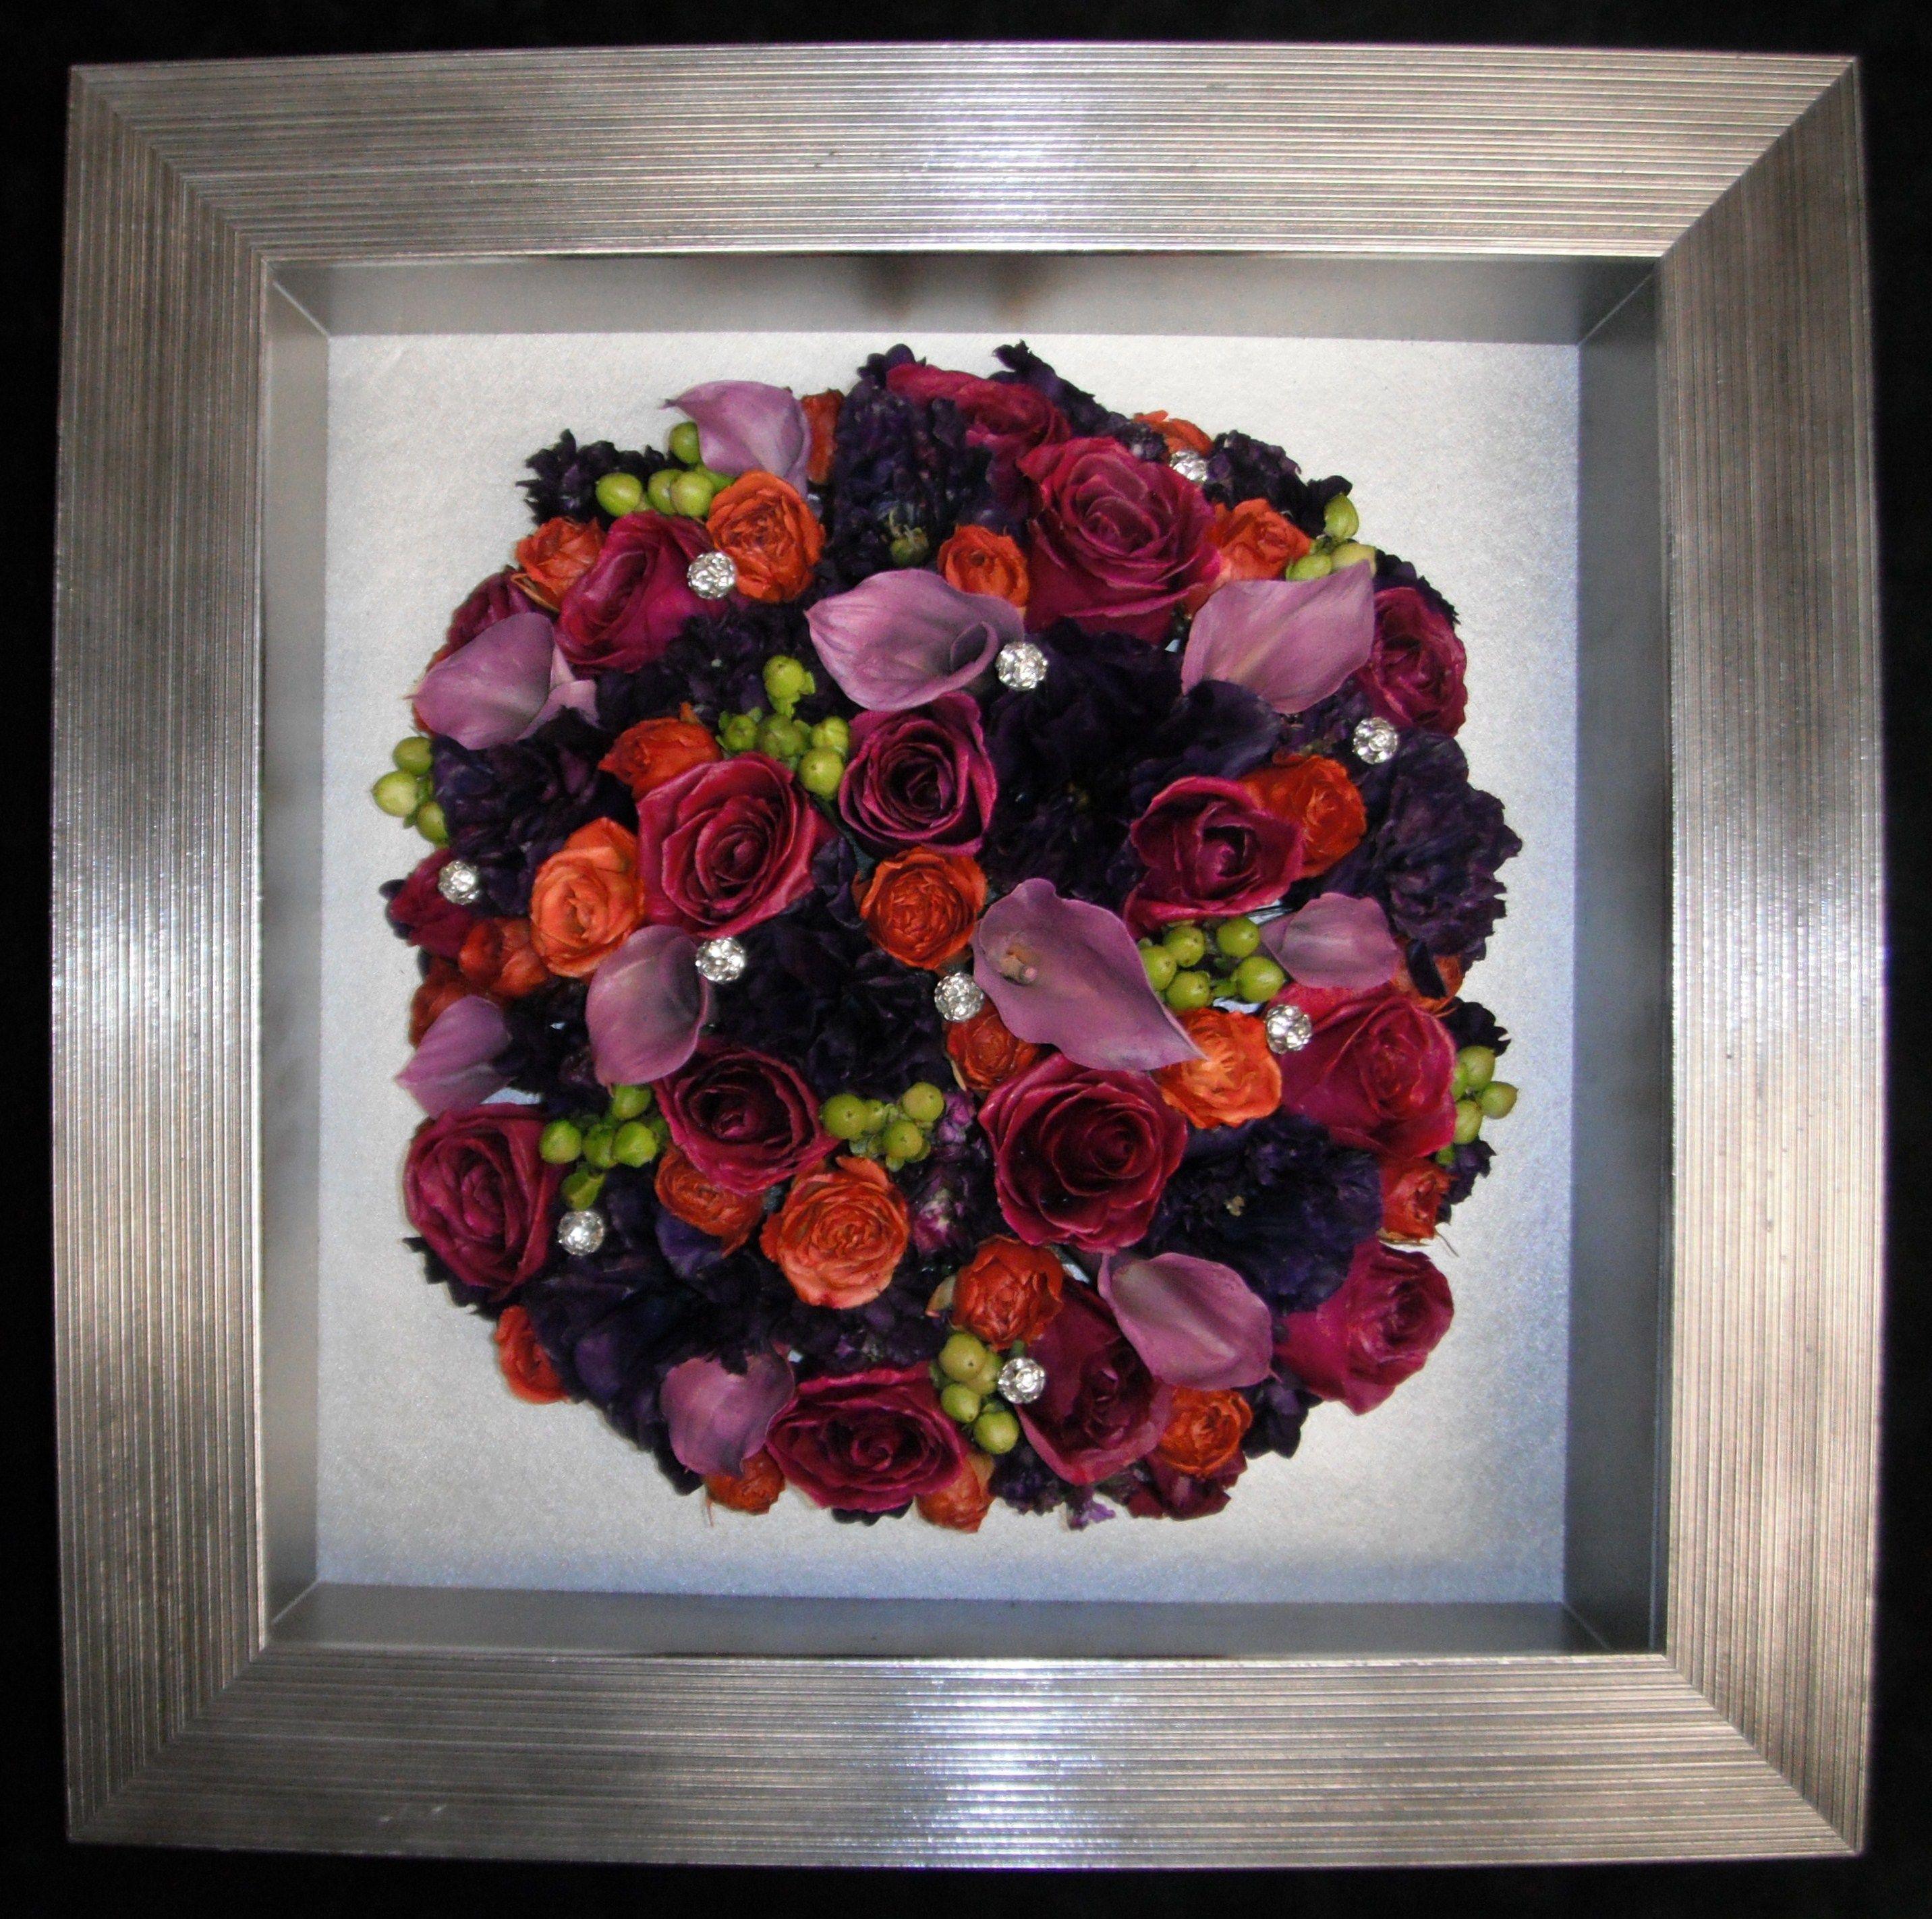 Freeze-dried wedding bouquet flowers in our custom shadow ...